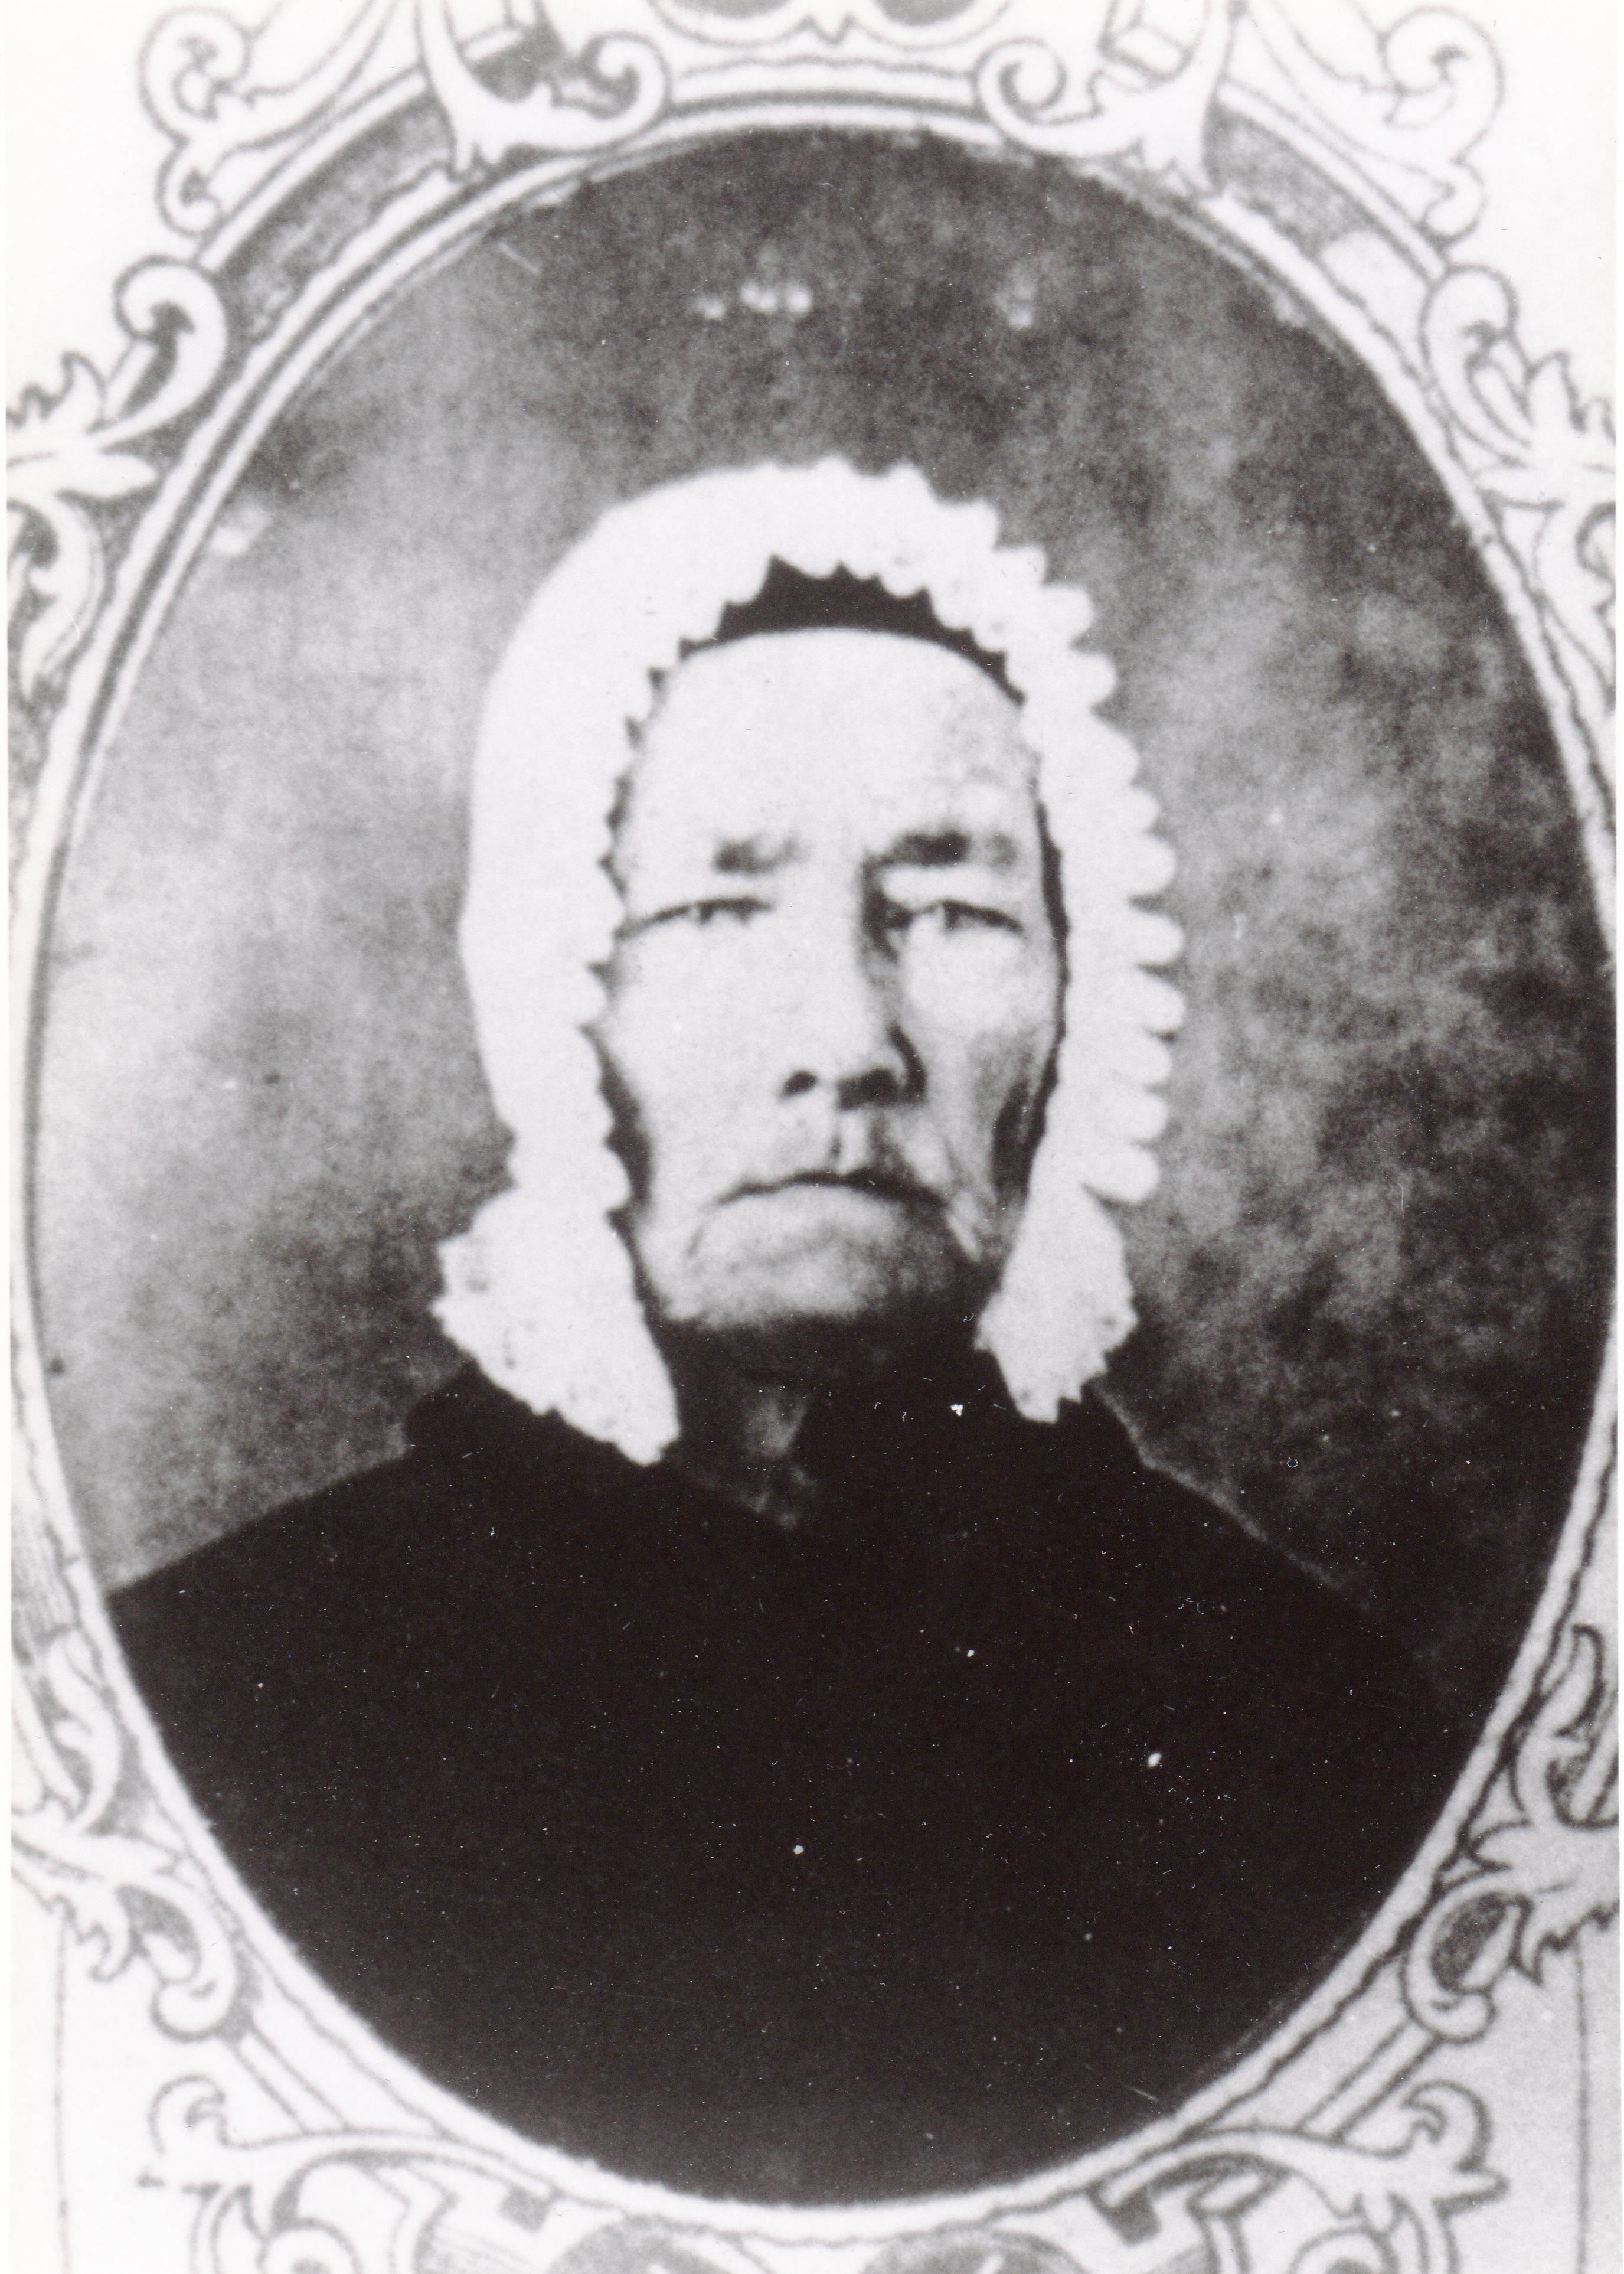 Image furthermore Missedinhistory together with Cc Dfa F Ab Da Abef moreover Dsc in addition Senator. on native americans american revolution